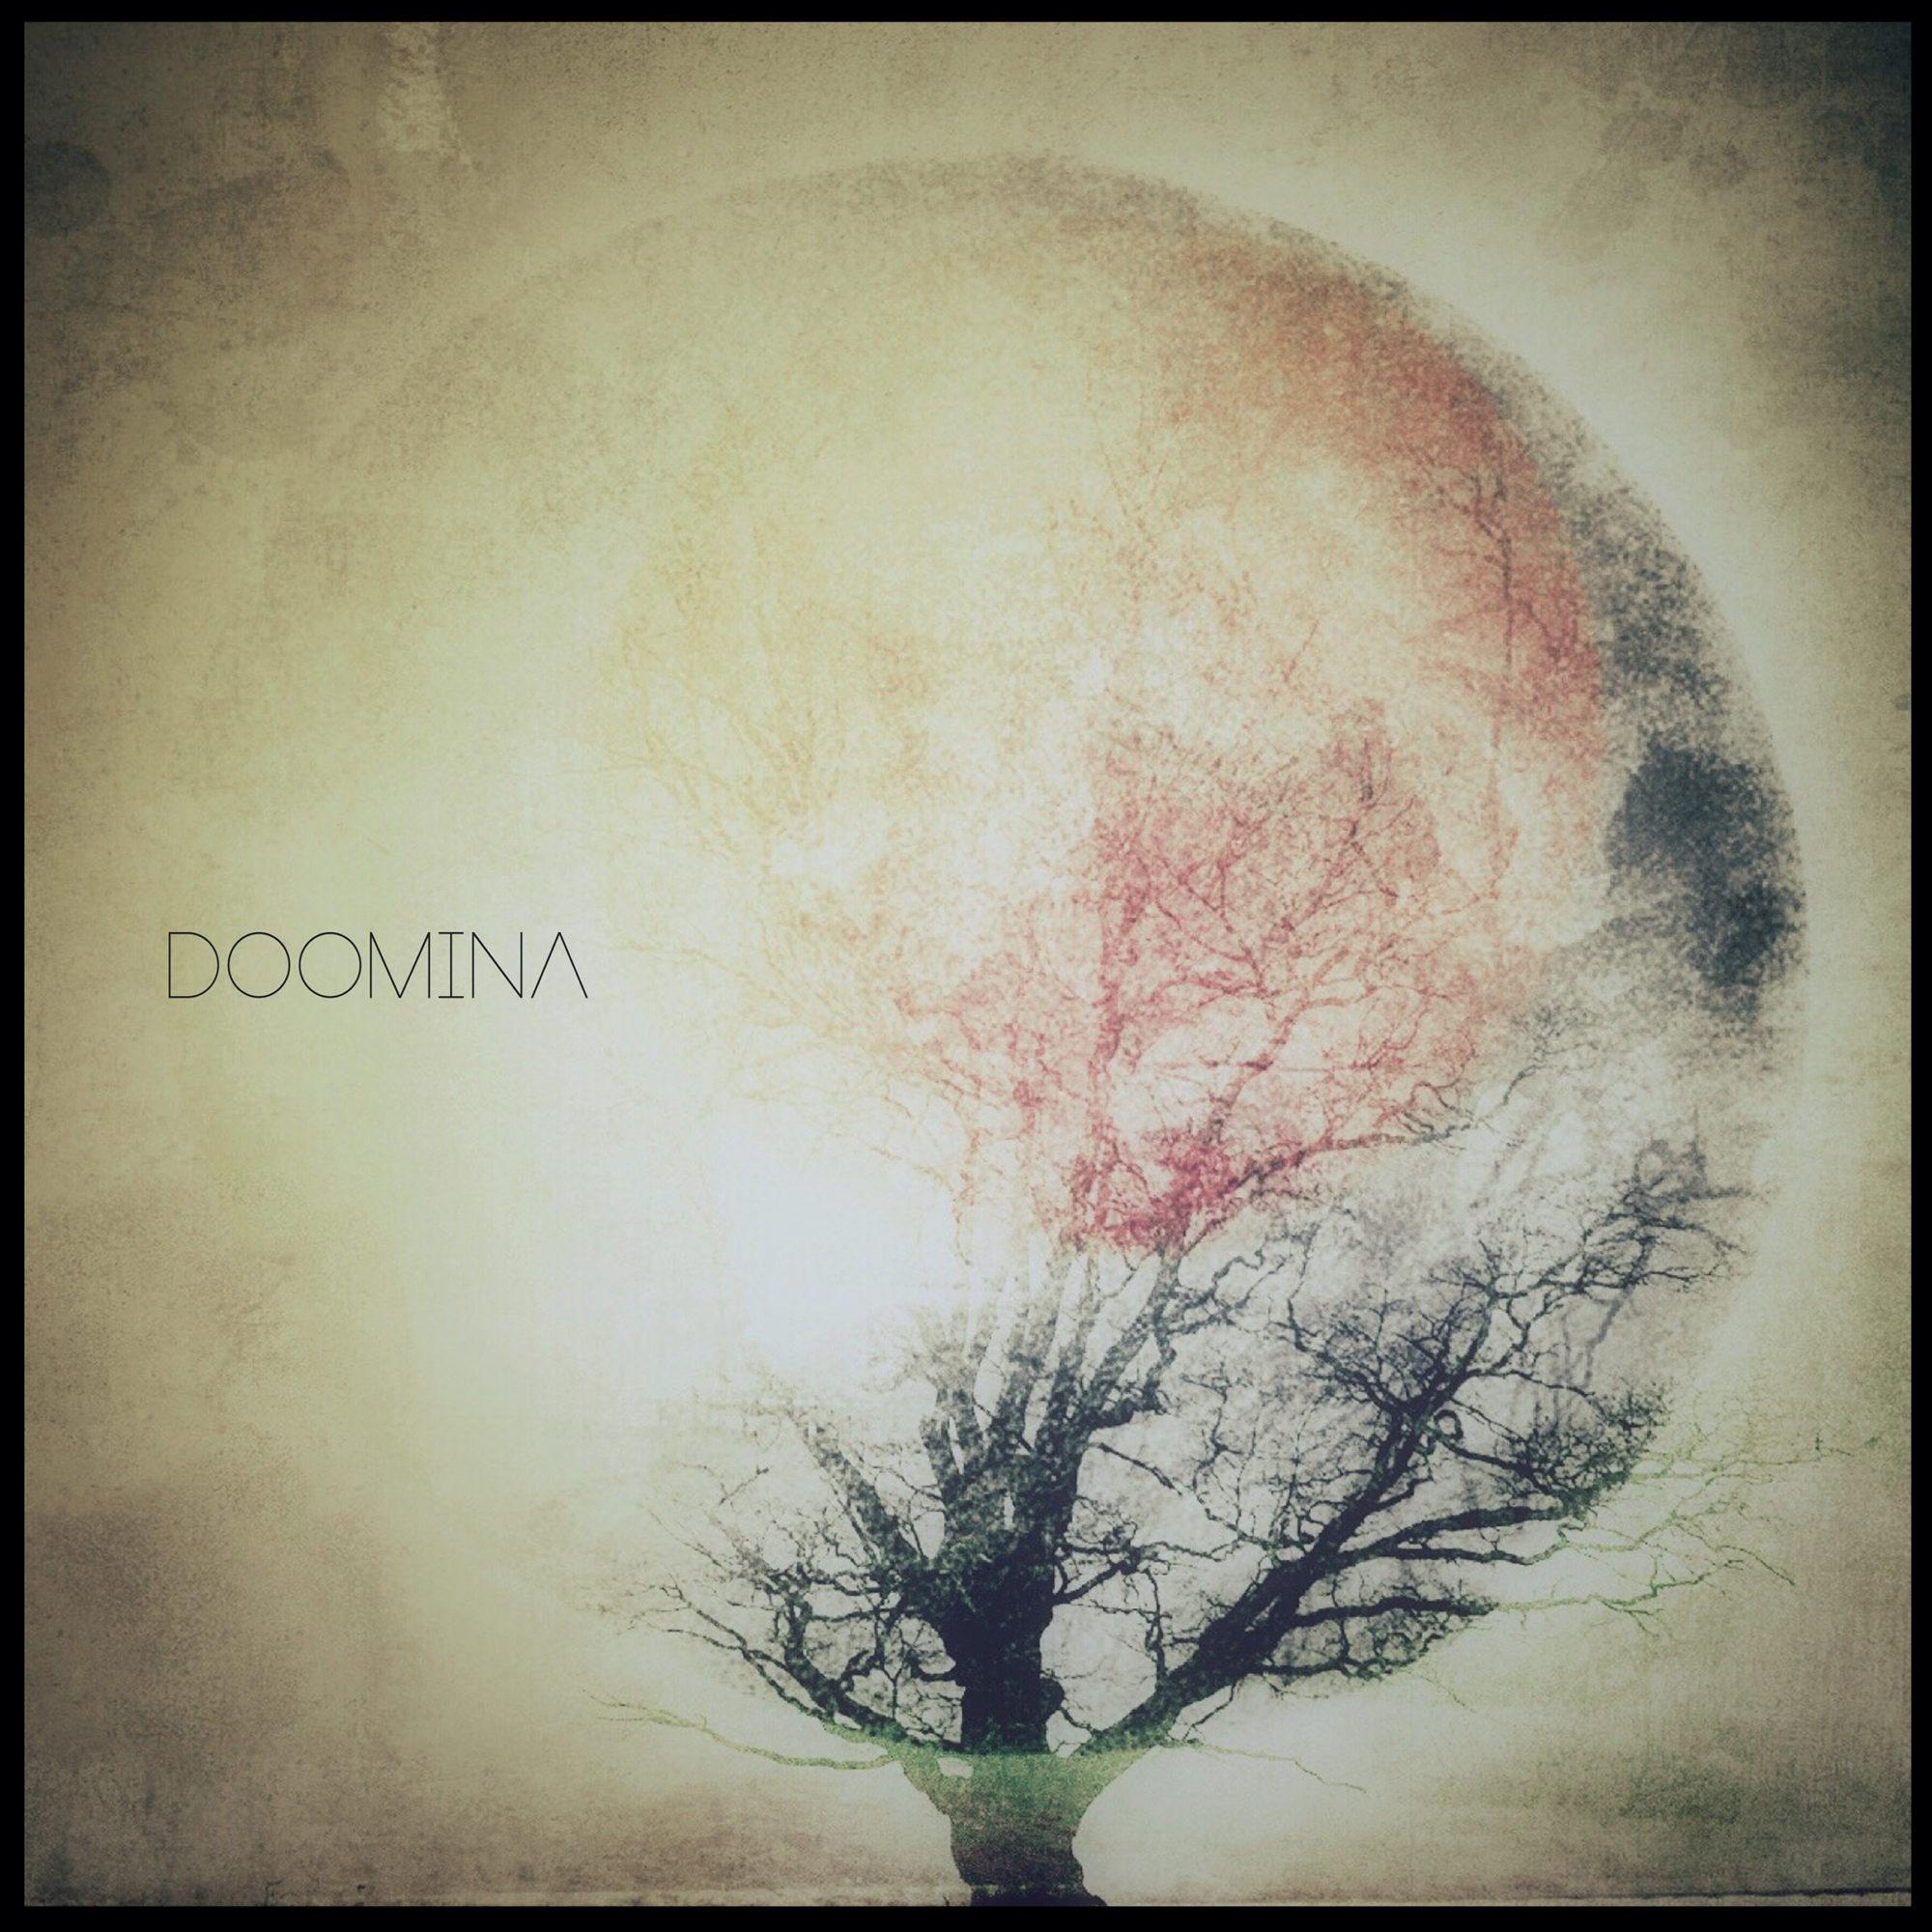 Doomina Band LP Cover Music Vinyl